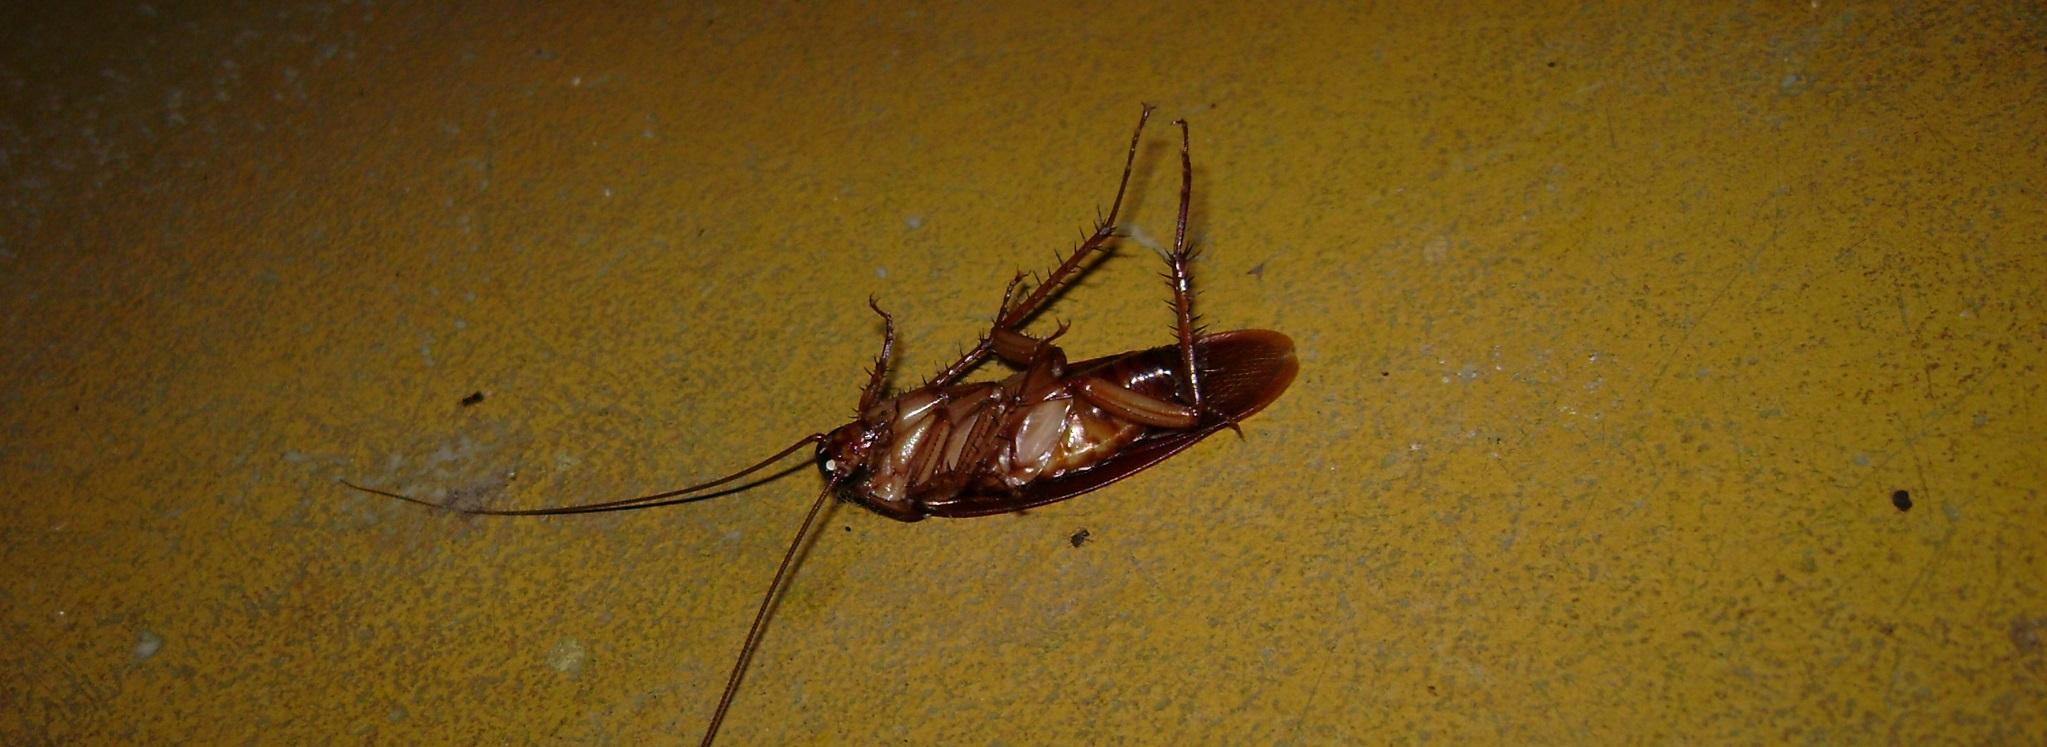 Eliminar Cucaracha